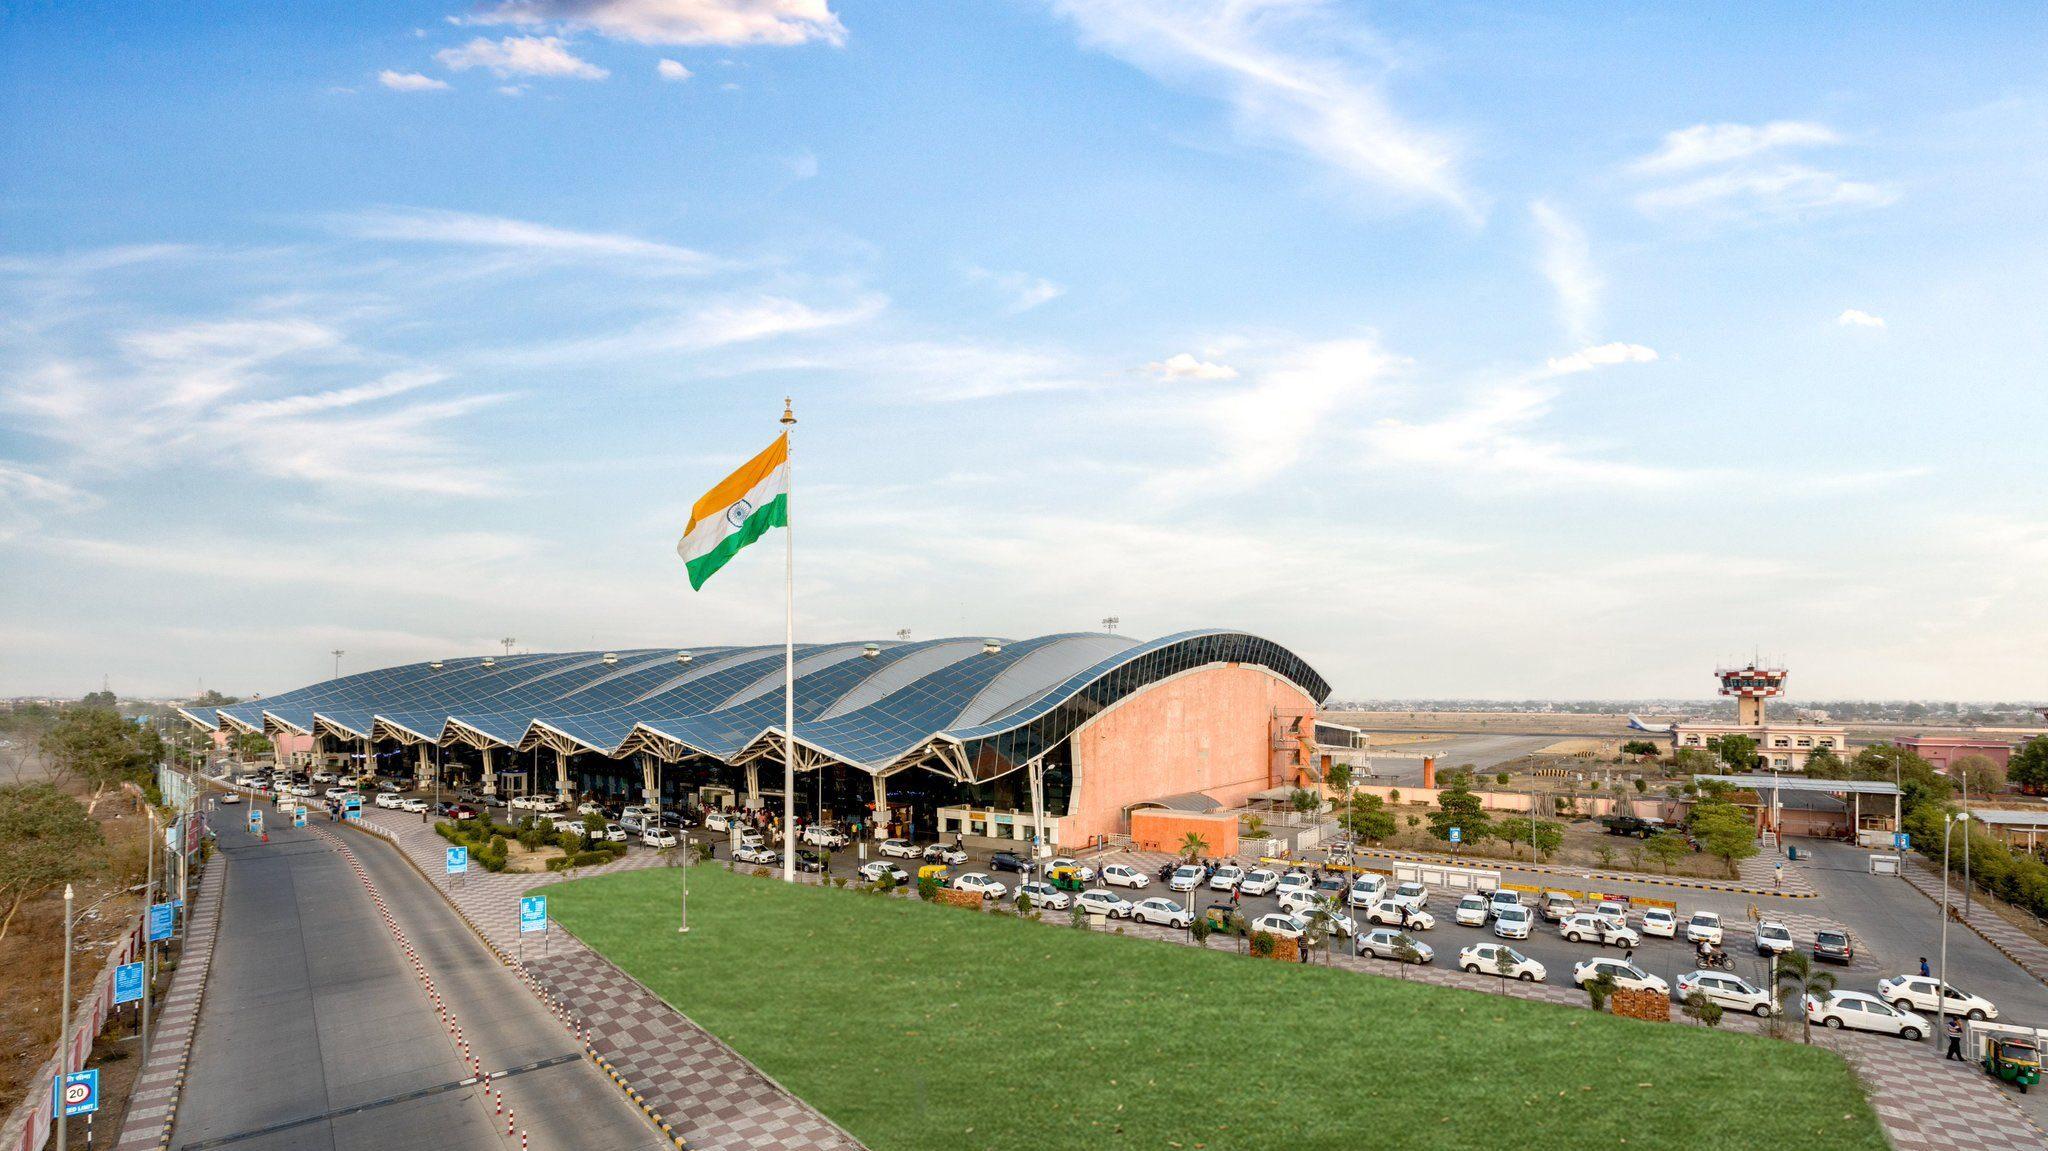 Devi Ahilya Bai Holkar Indore Airport is the busiest airport in Madhya Pradesh